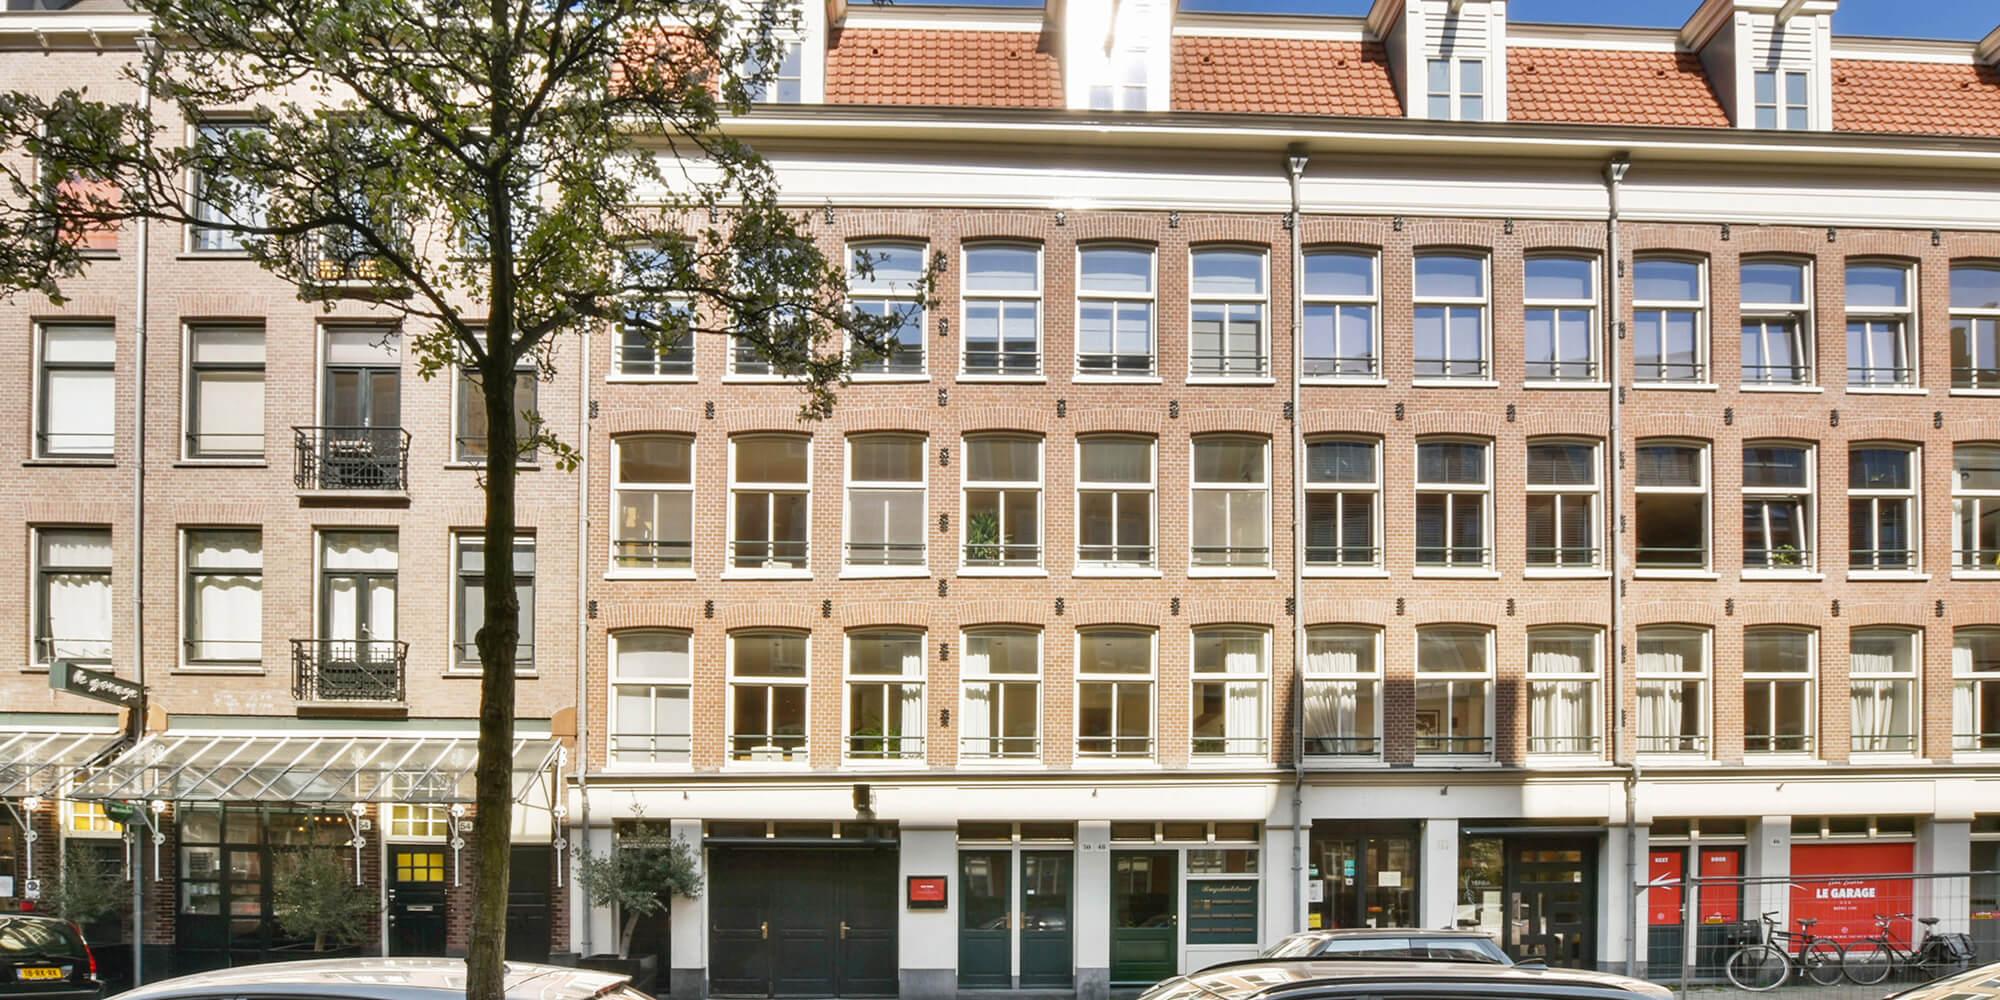 Ruysdaelstraat Amsterdam Zuid